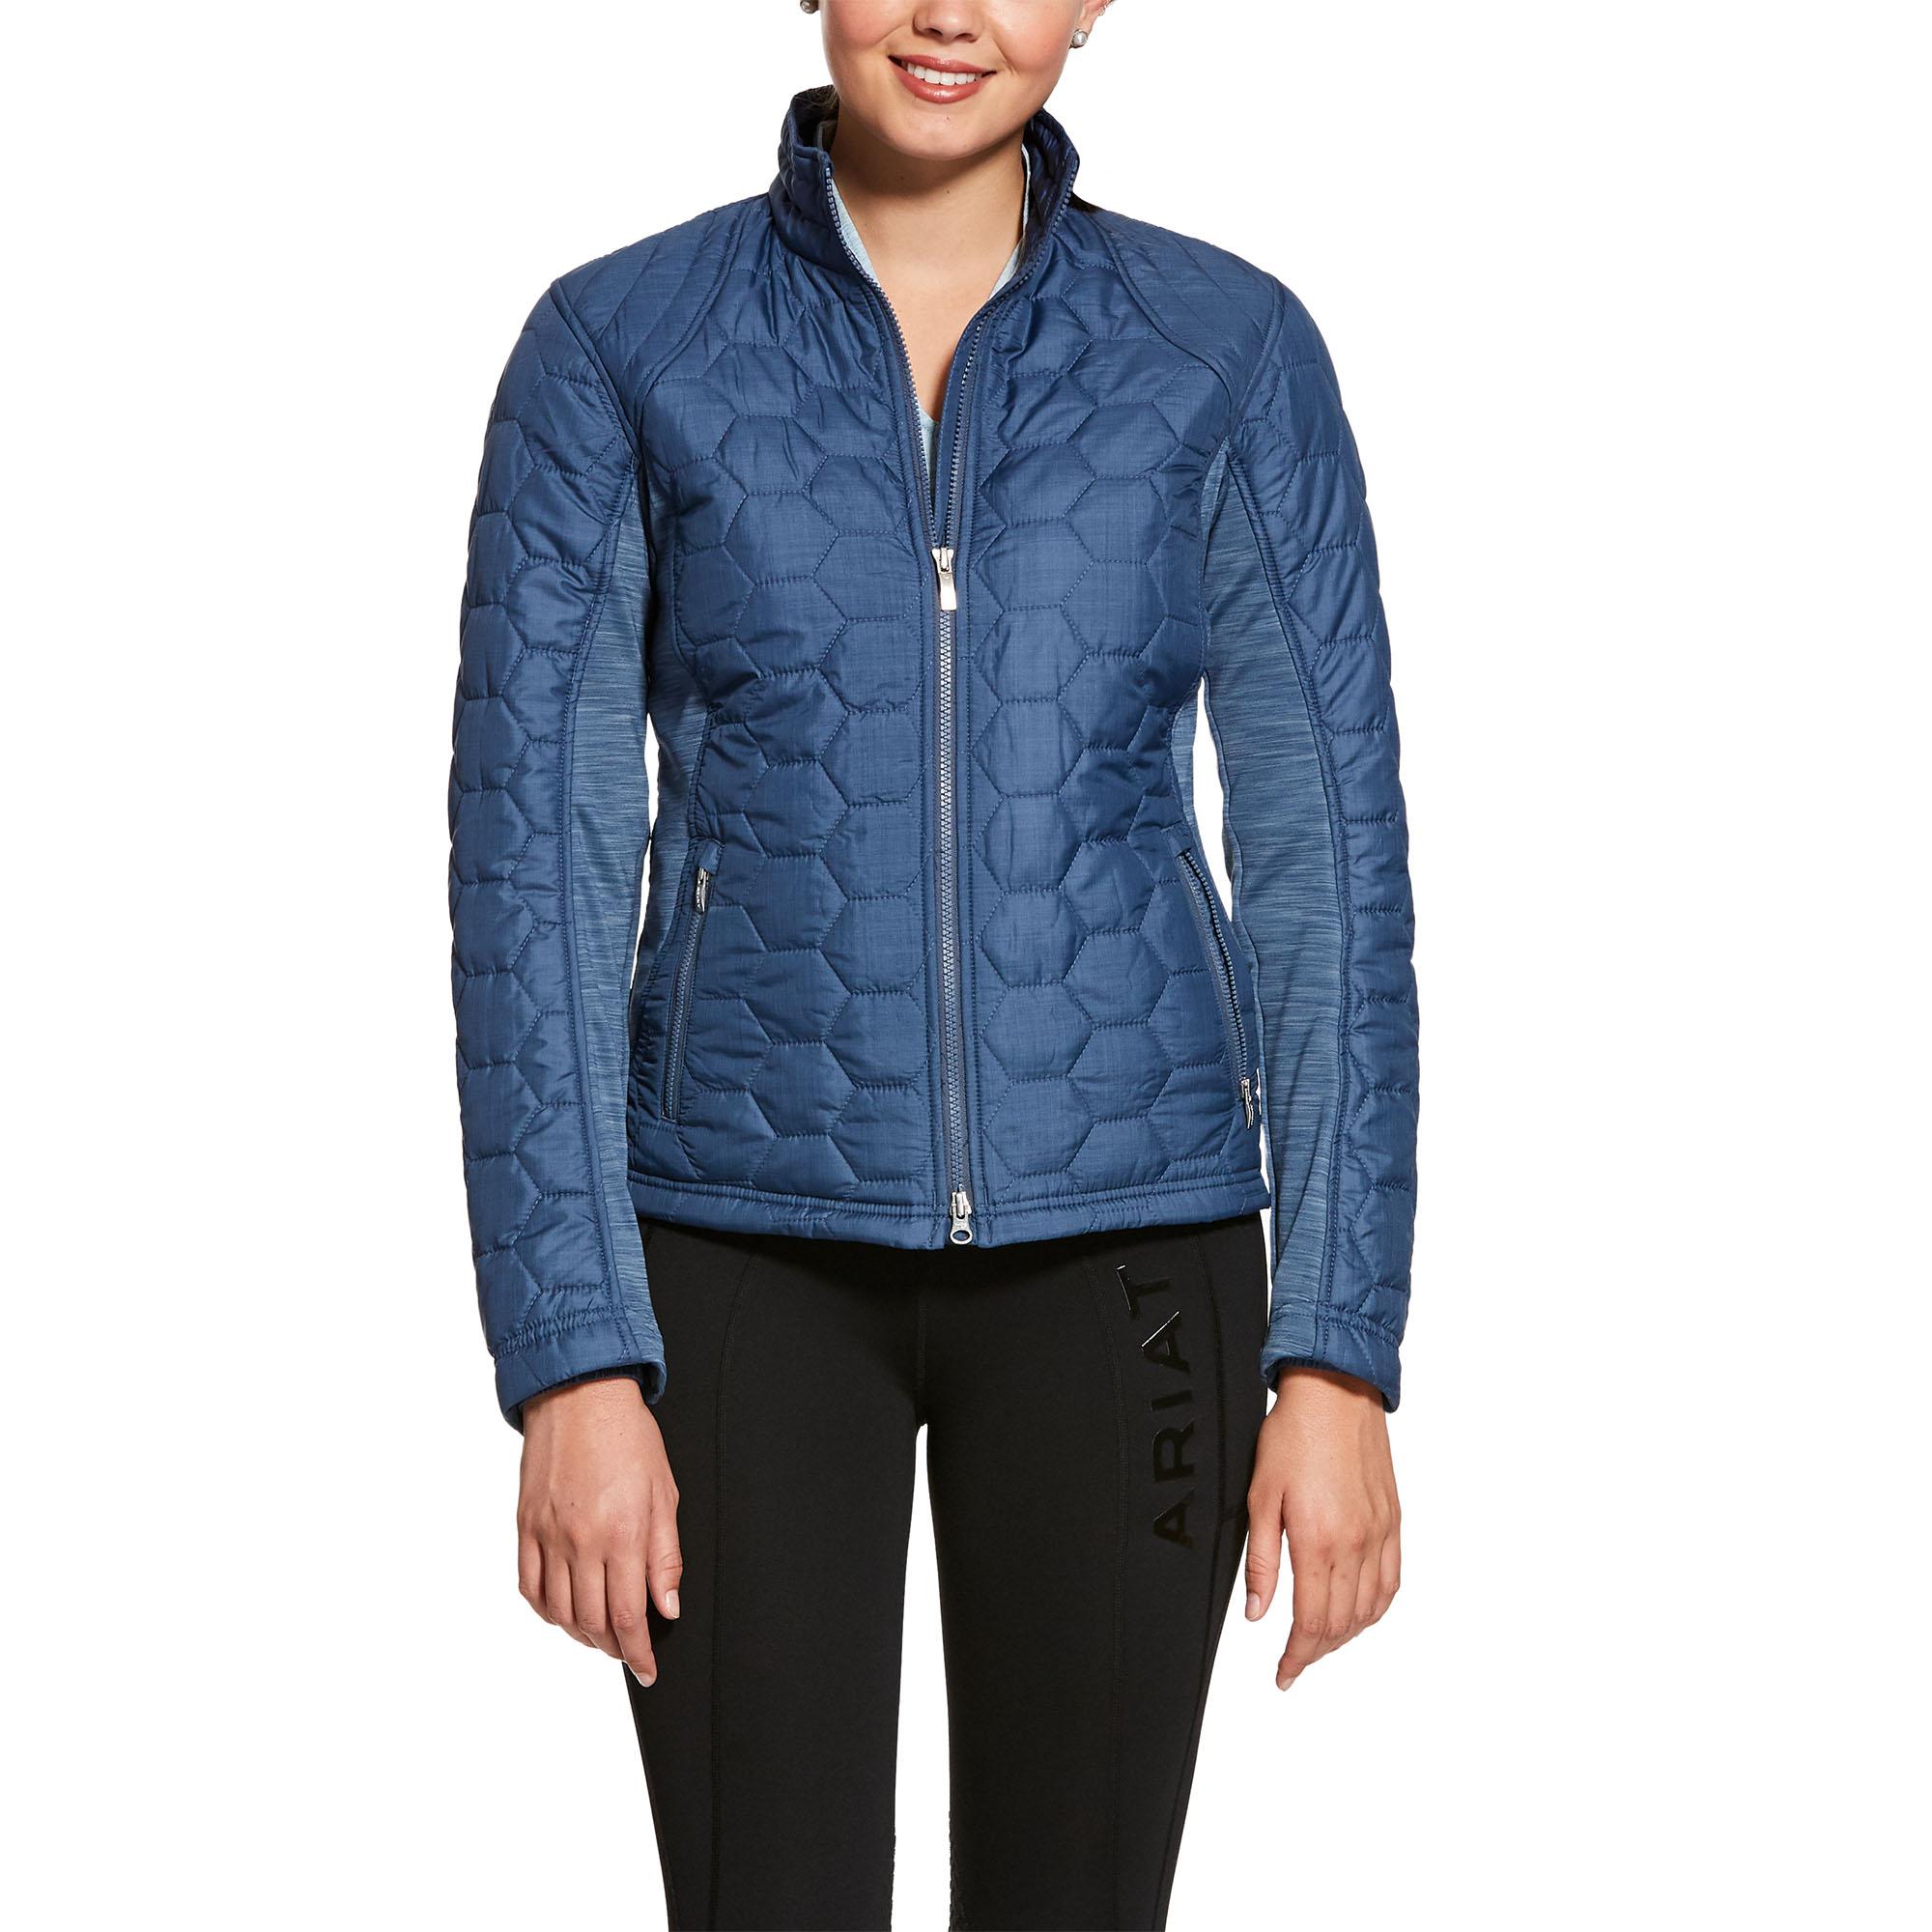 Ariat Womens Volt Jacket